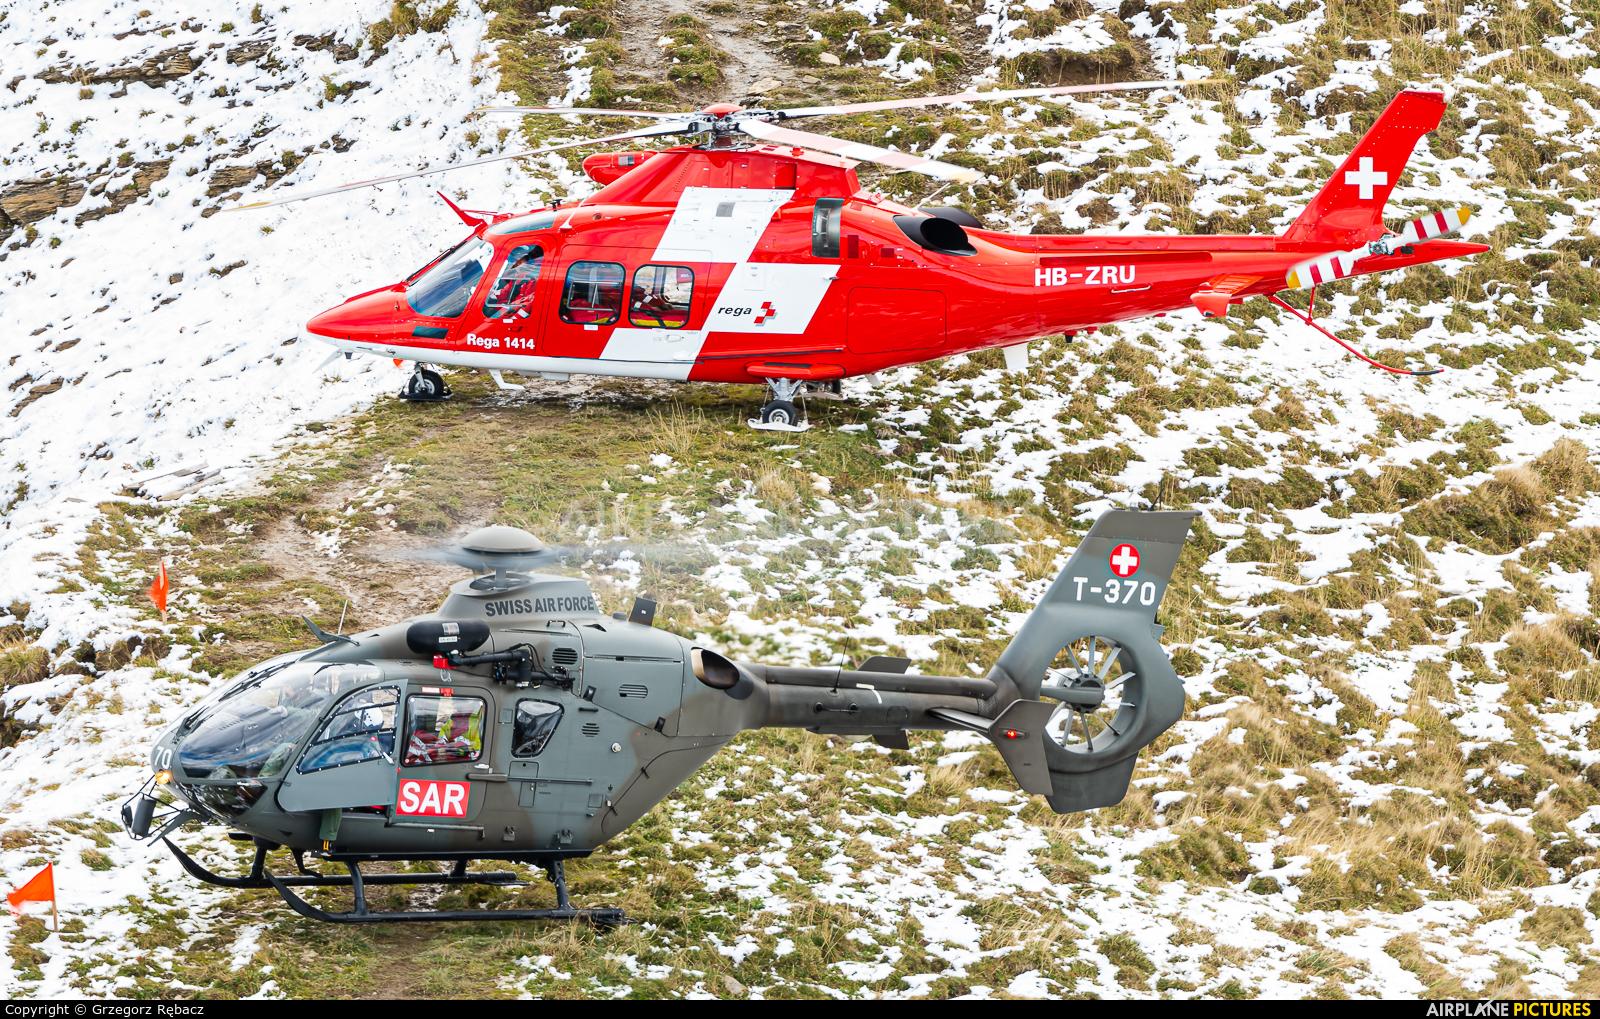 REGA Swiss Air Ambulance  HB-ZRU aircraft at Axalp - Ebenfluh Range